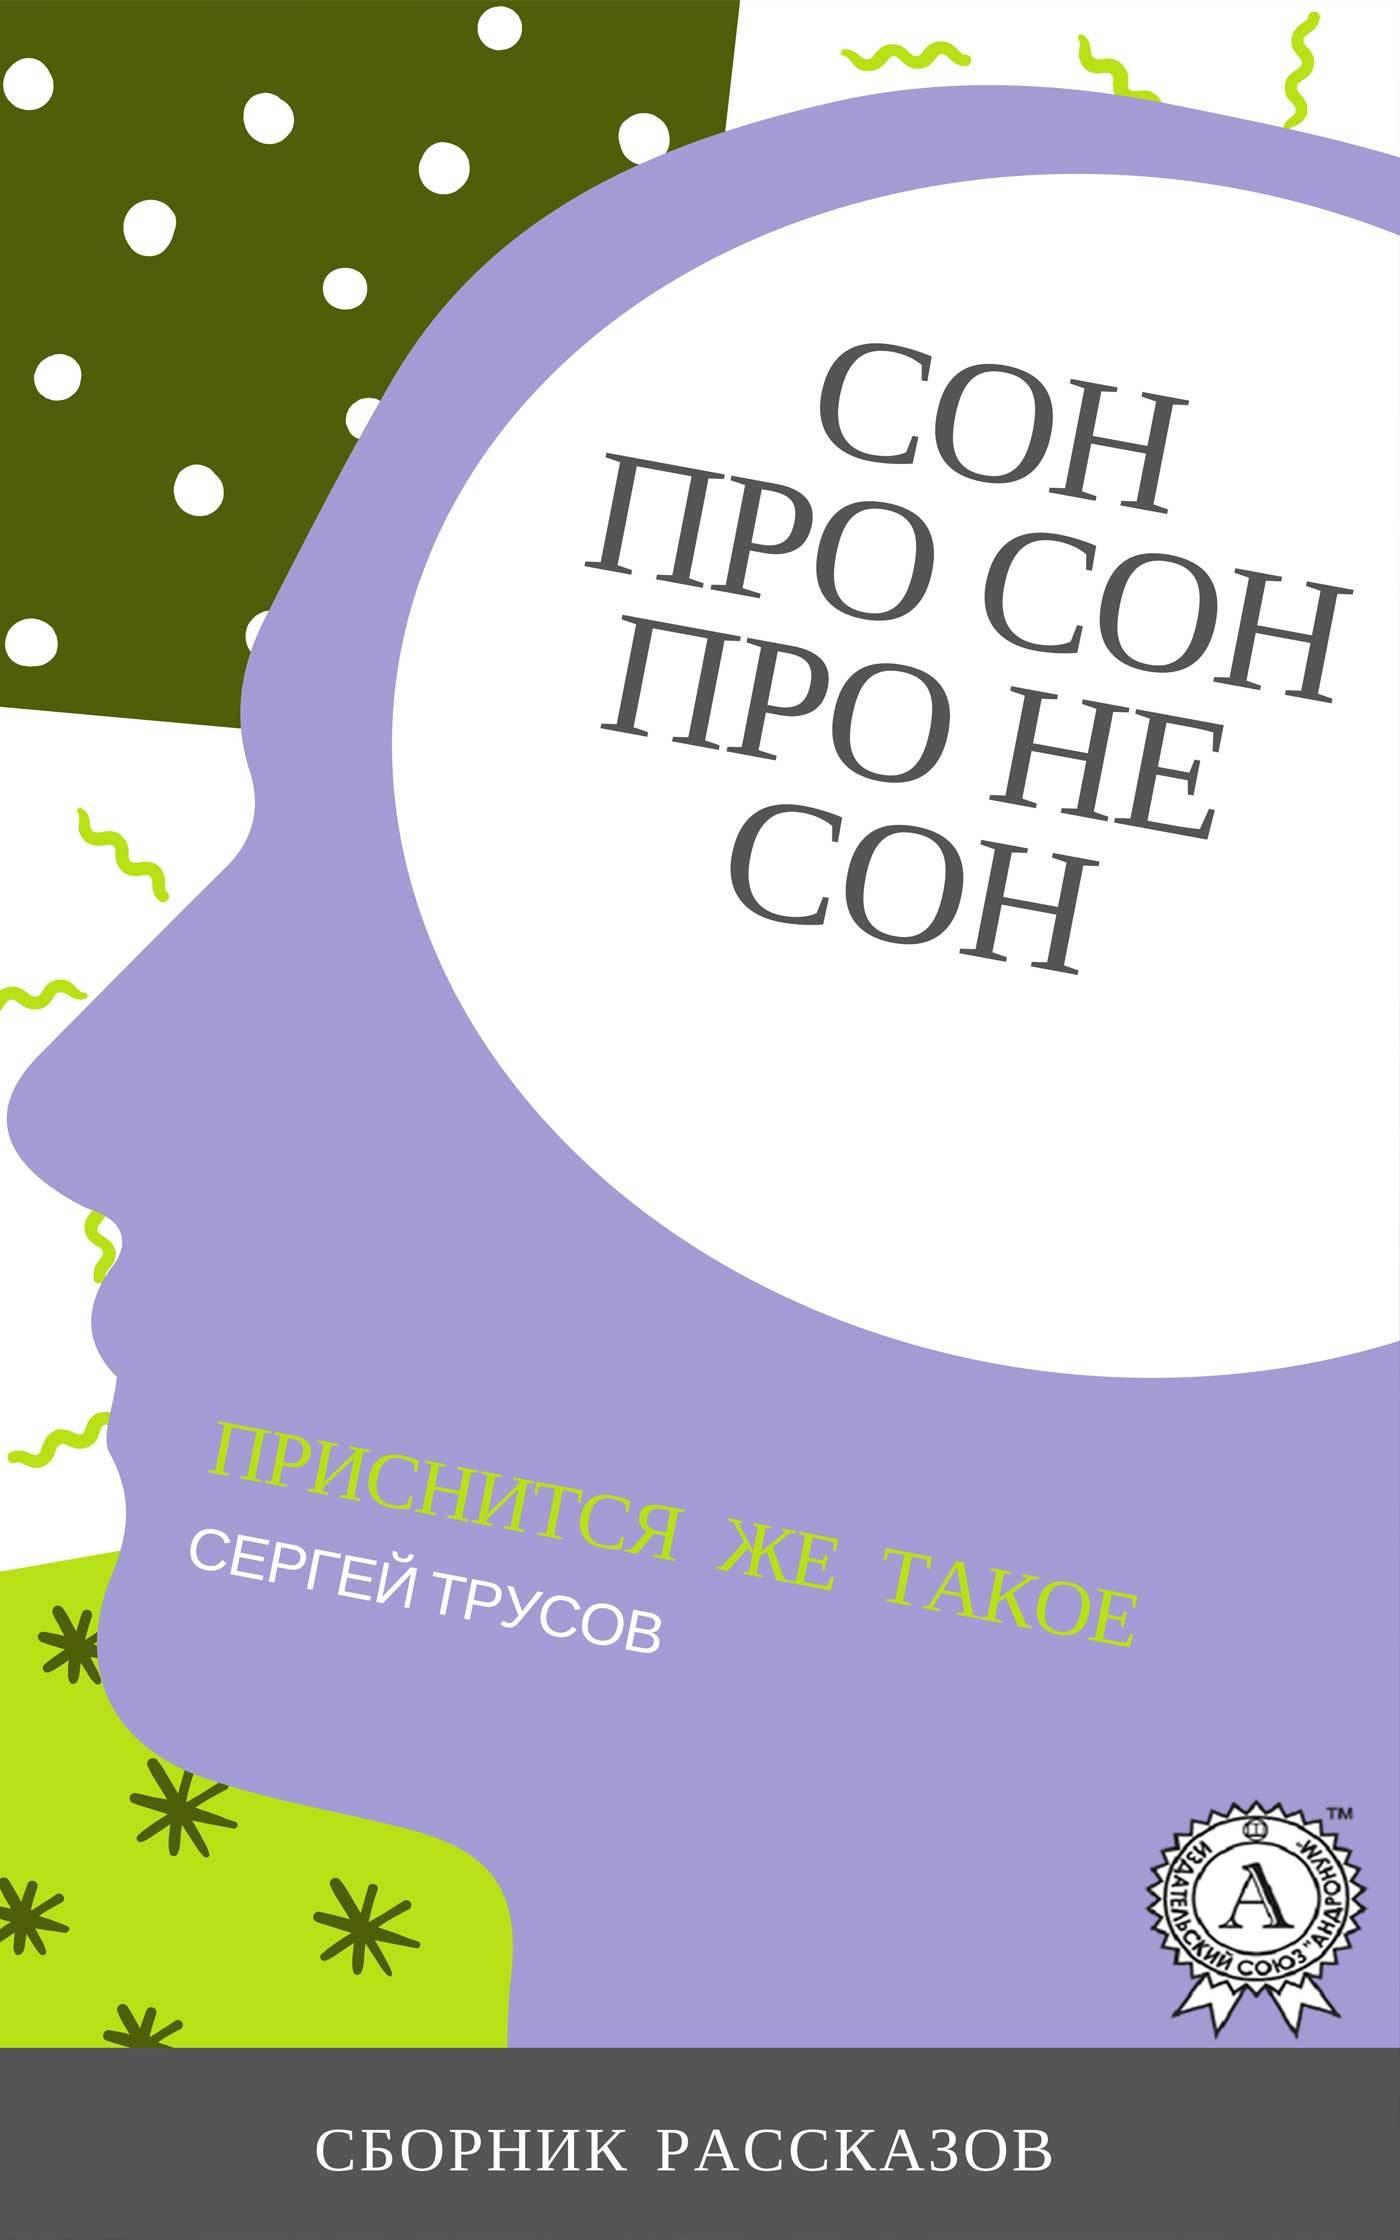 Сергей Трусов Сон, про сон, про не сон